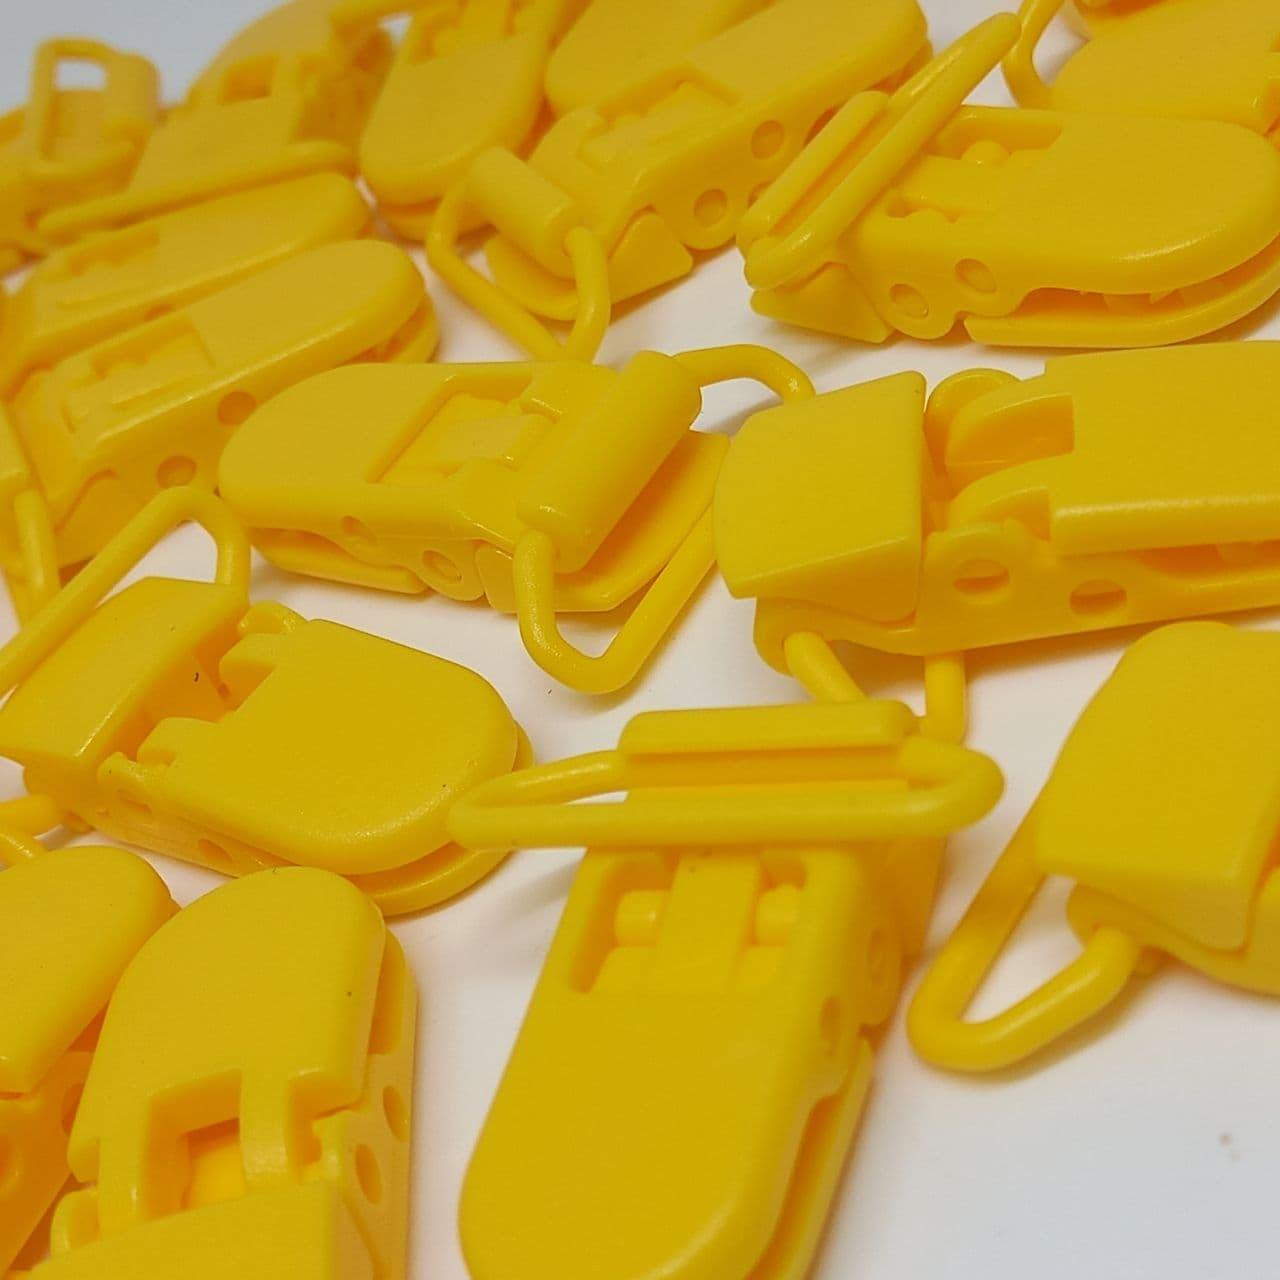 Prendedor de chupeta boca de jacaré amarelo cheddar 38x9mm / unidade